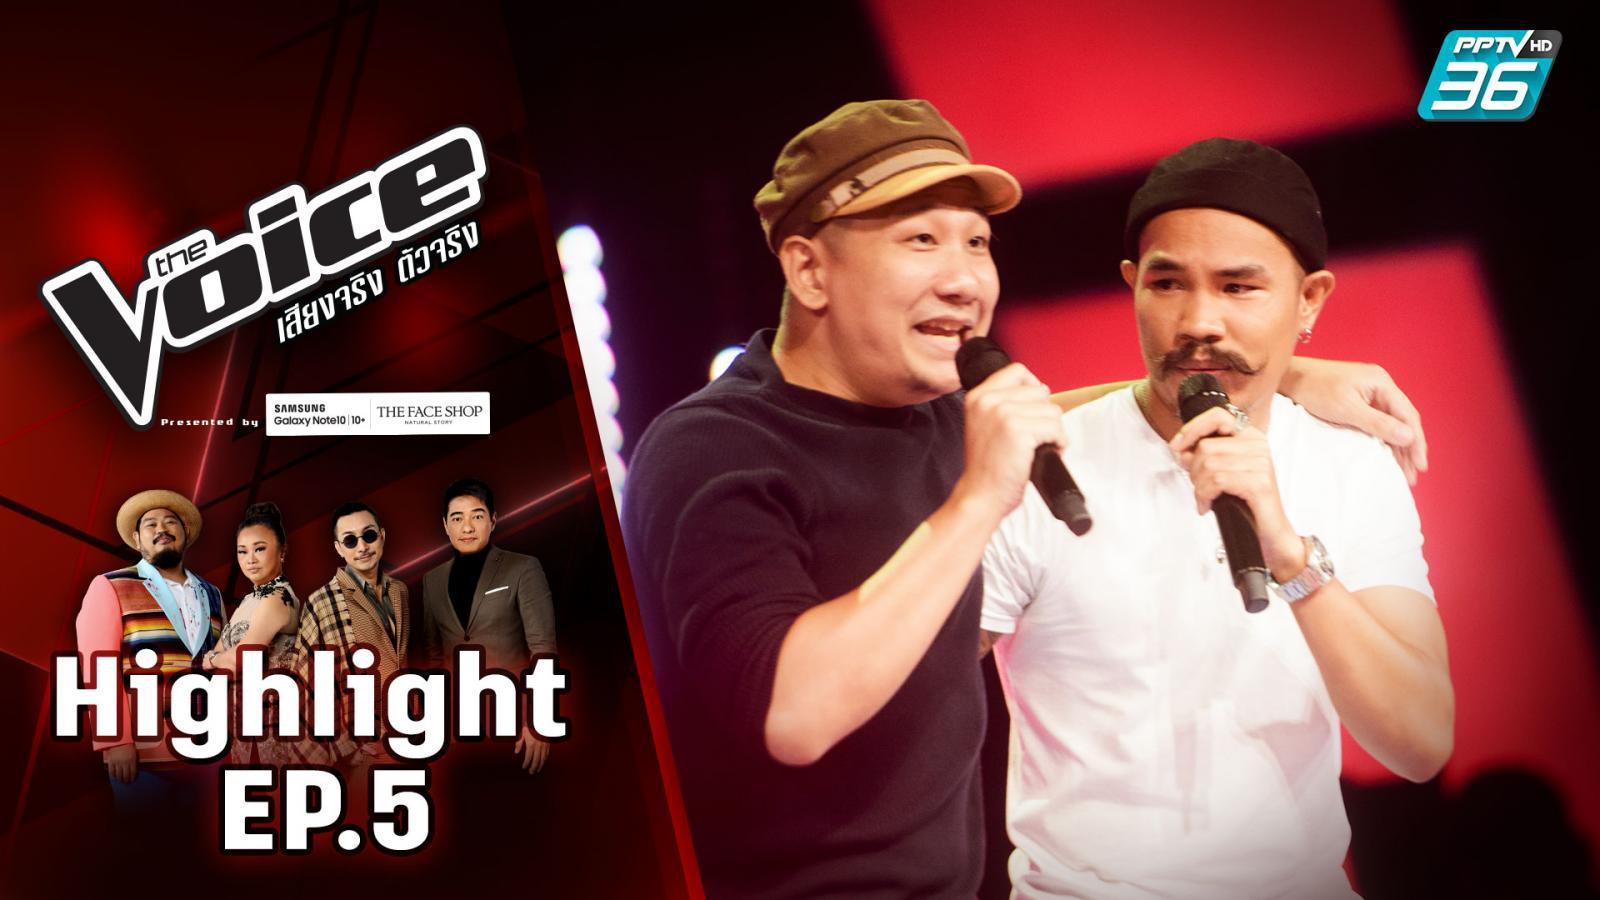 The Voice 2019 | เดอะซัน หนุ่มพนักงานร้านอาหารที่มีใจรักในเสียงเพลง  | Highlight EP5